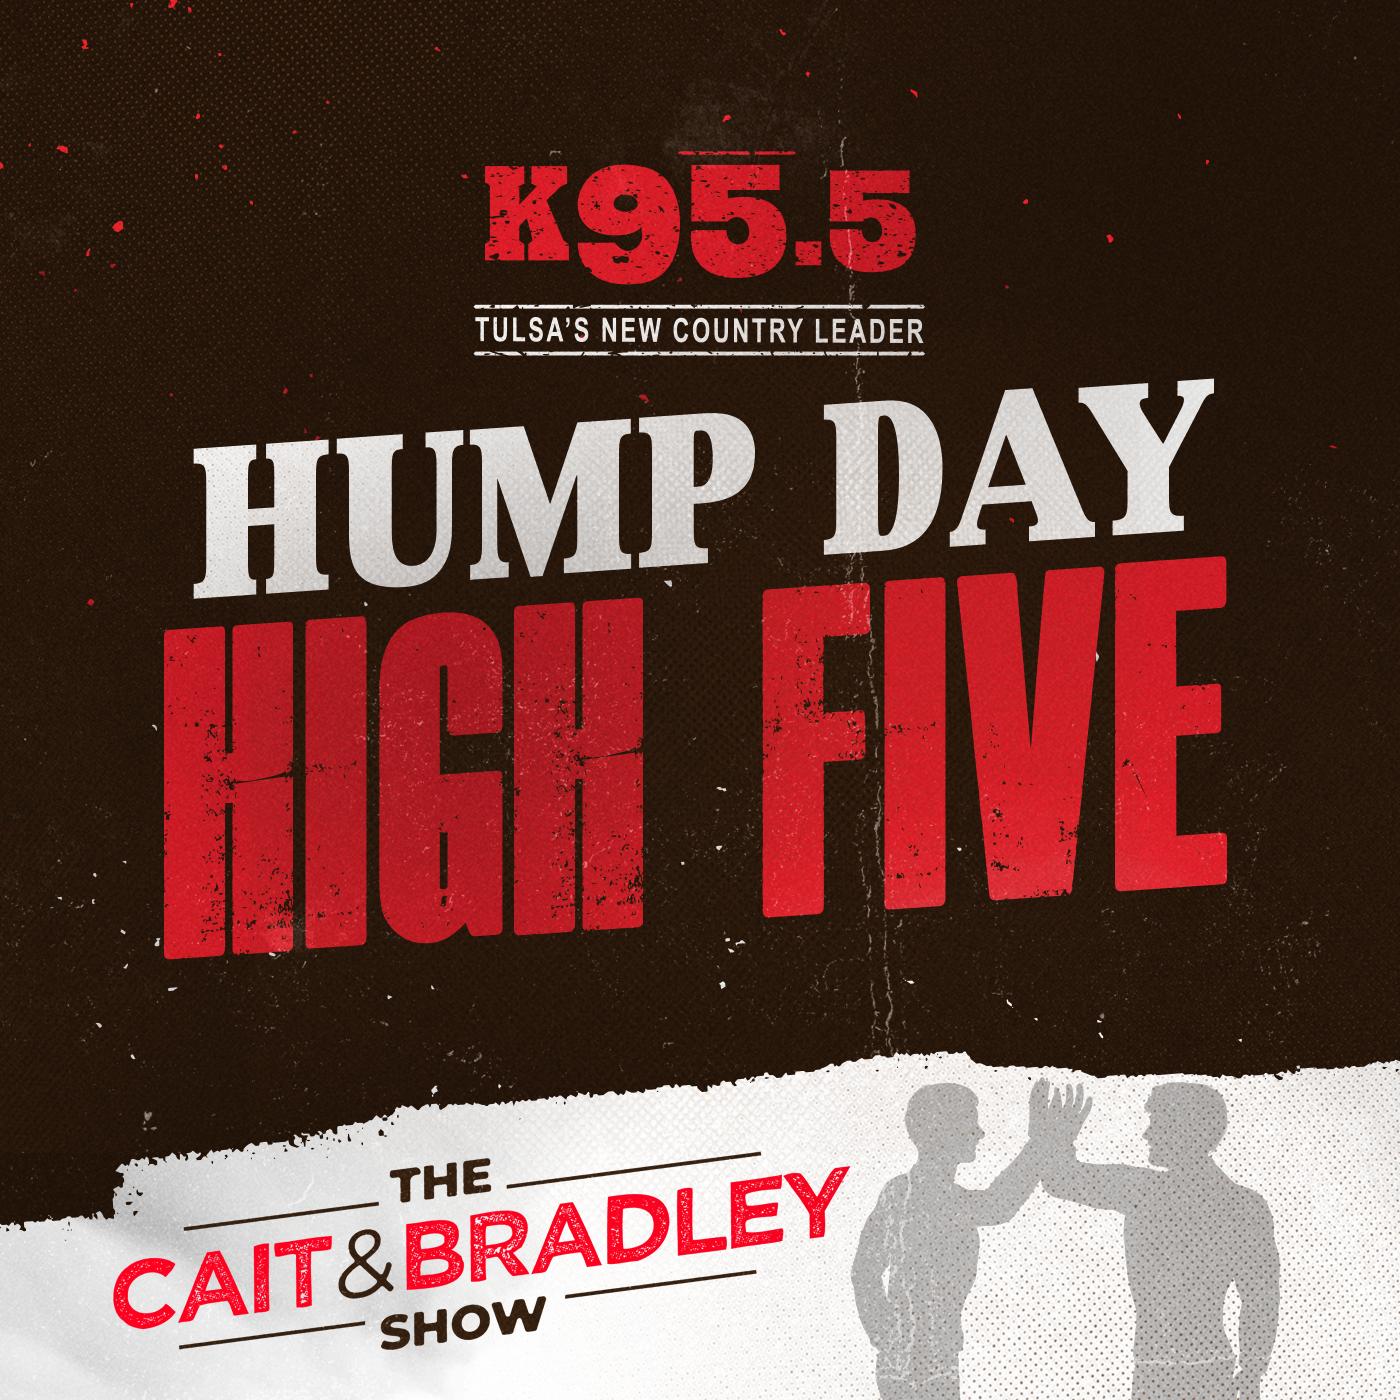 Hump Day High Five